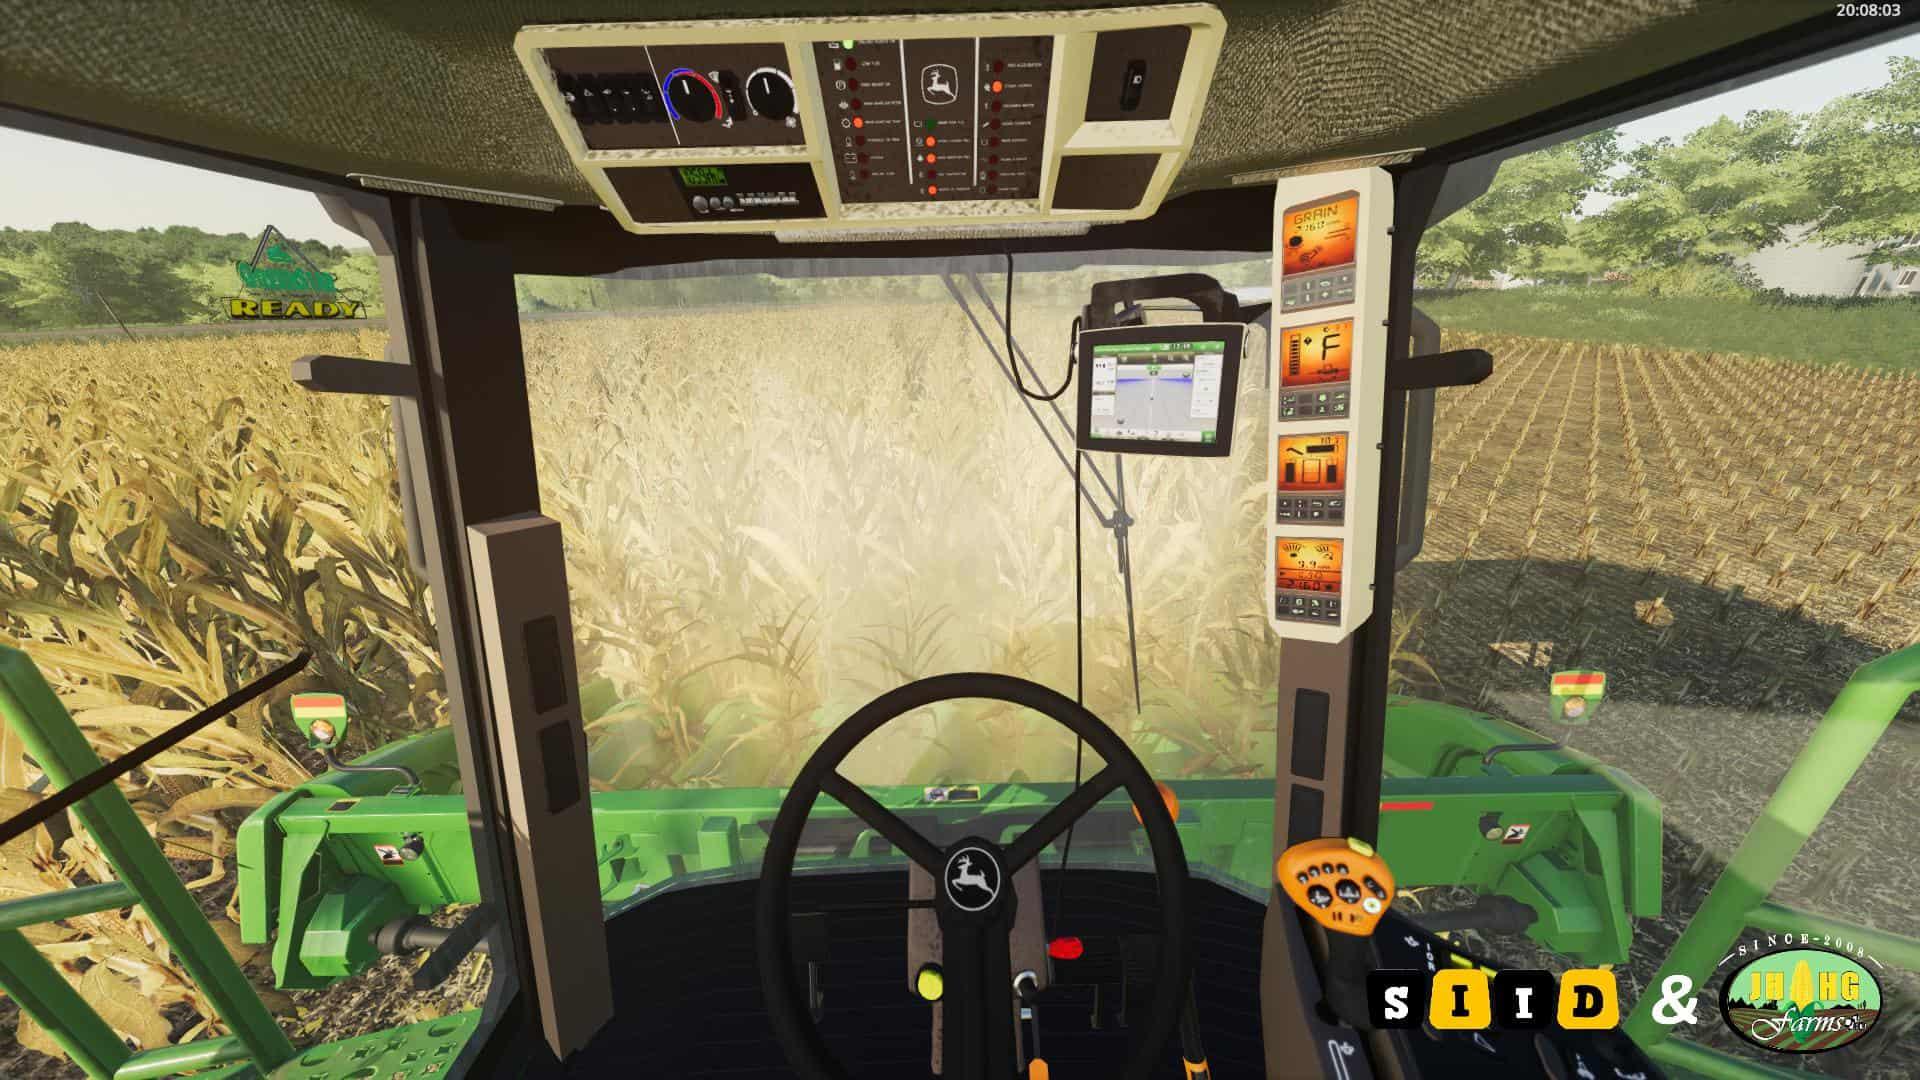 FS19 John Deere STS 60-70 series v2 1 - Farming simulator